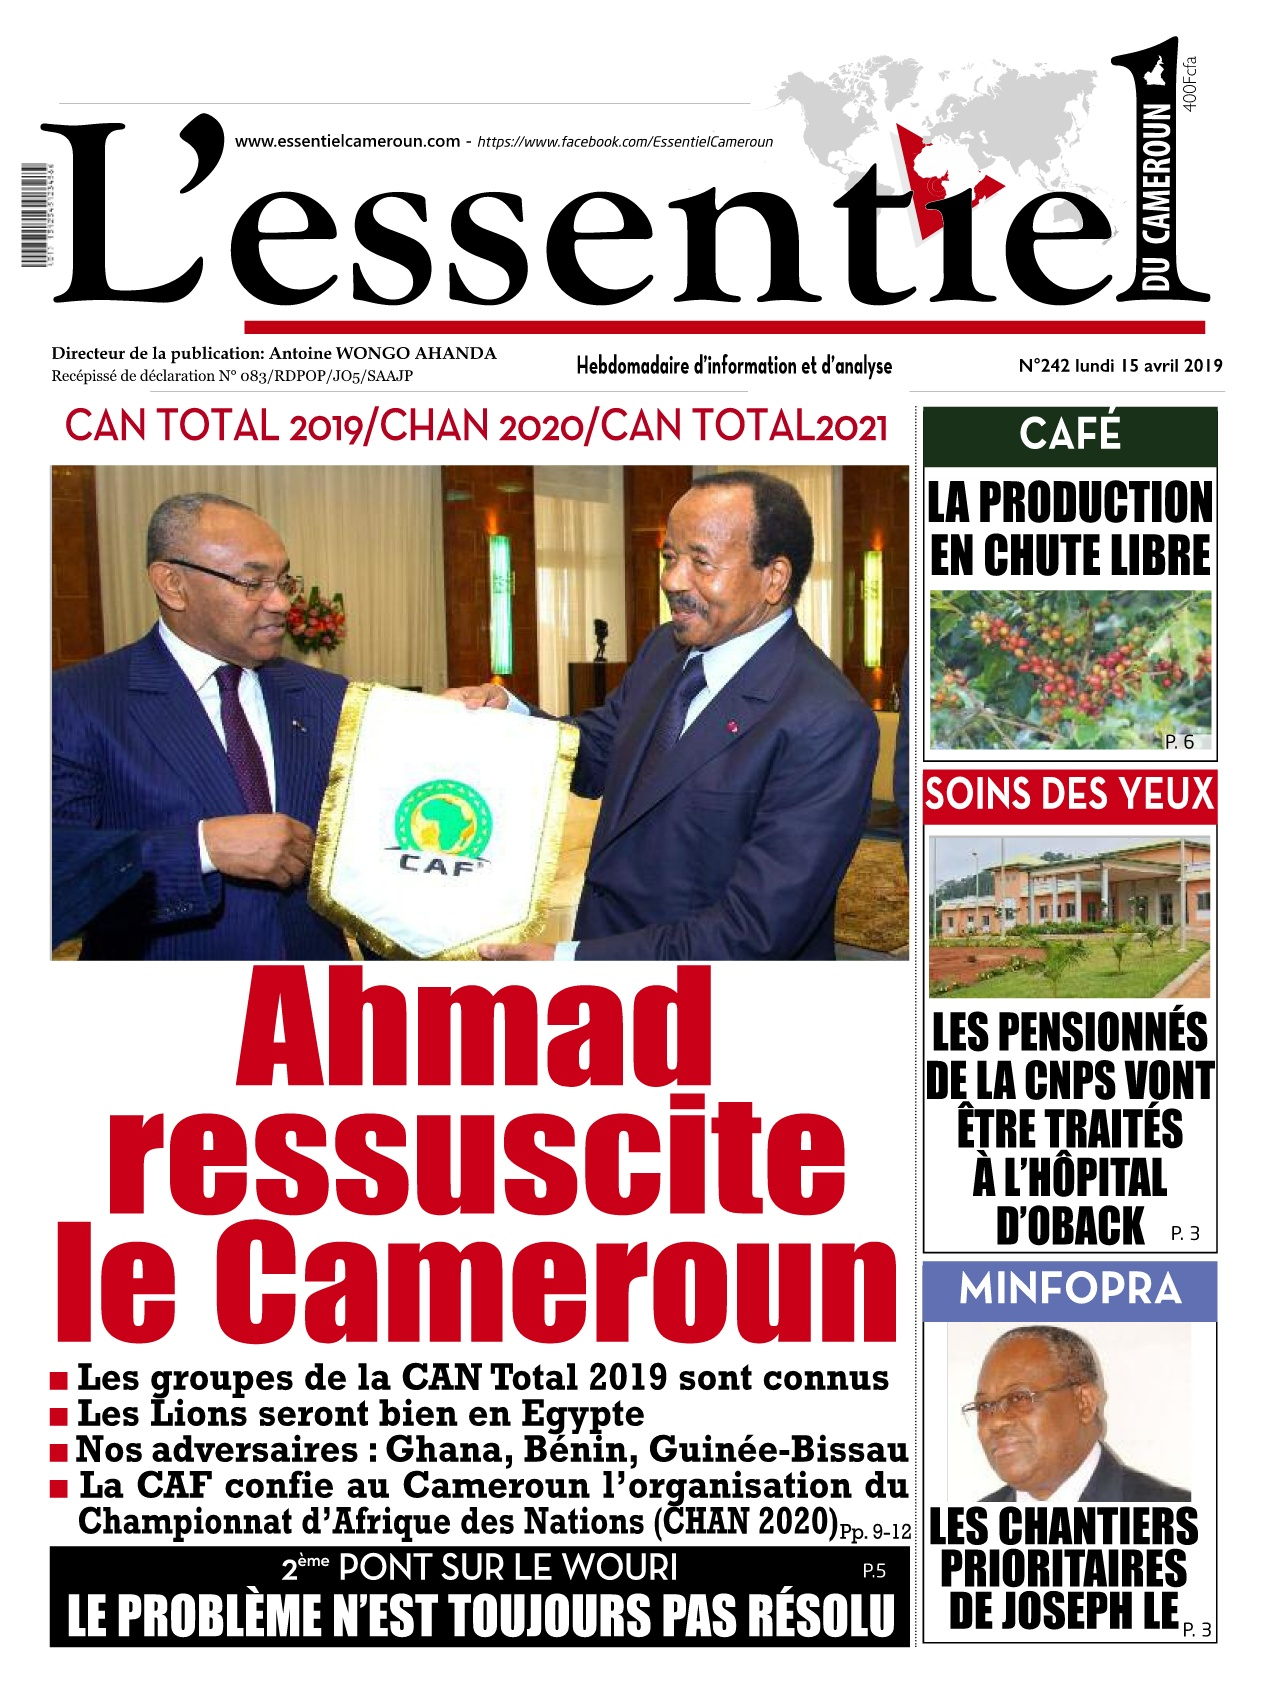 L&#039;essentiel du Cameroun <br/> 15/04/2019